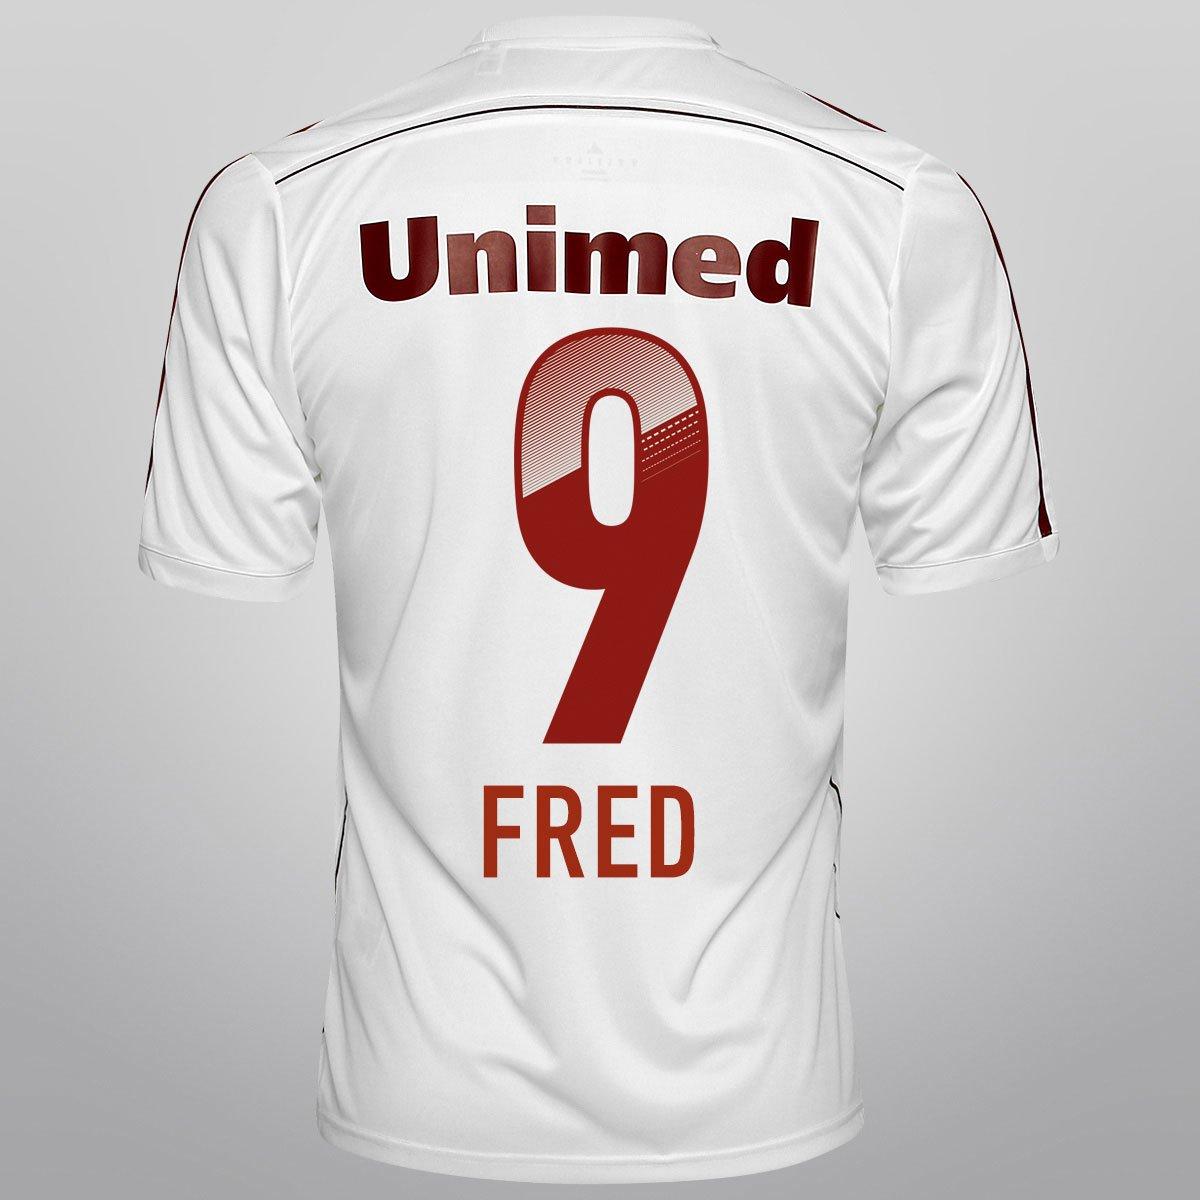 1513fbcdbc Camisa Adidas Fluminense II 14 15 nº 9 - Fred - Compre Agora